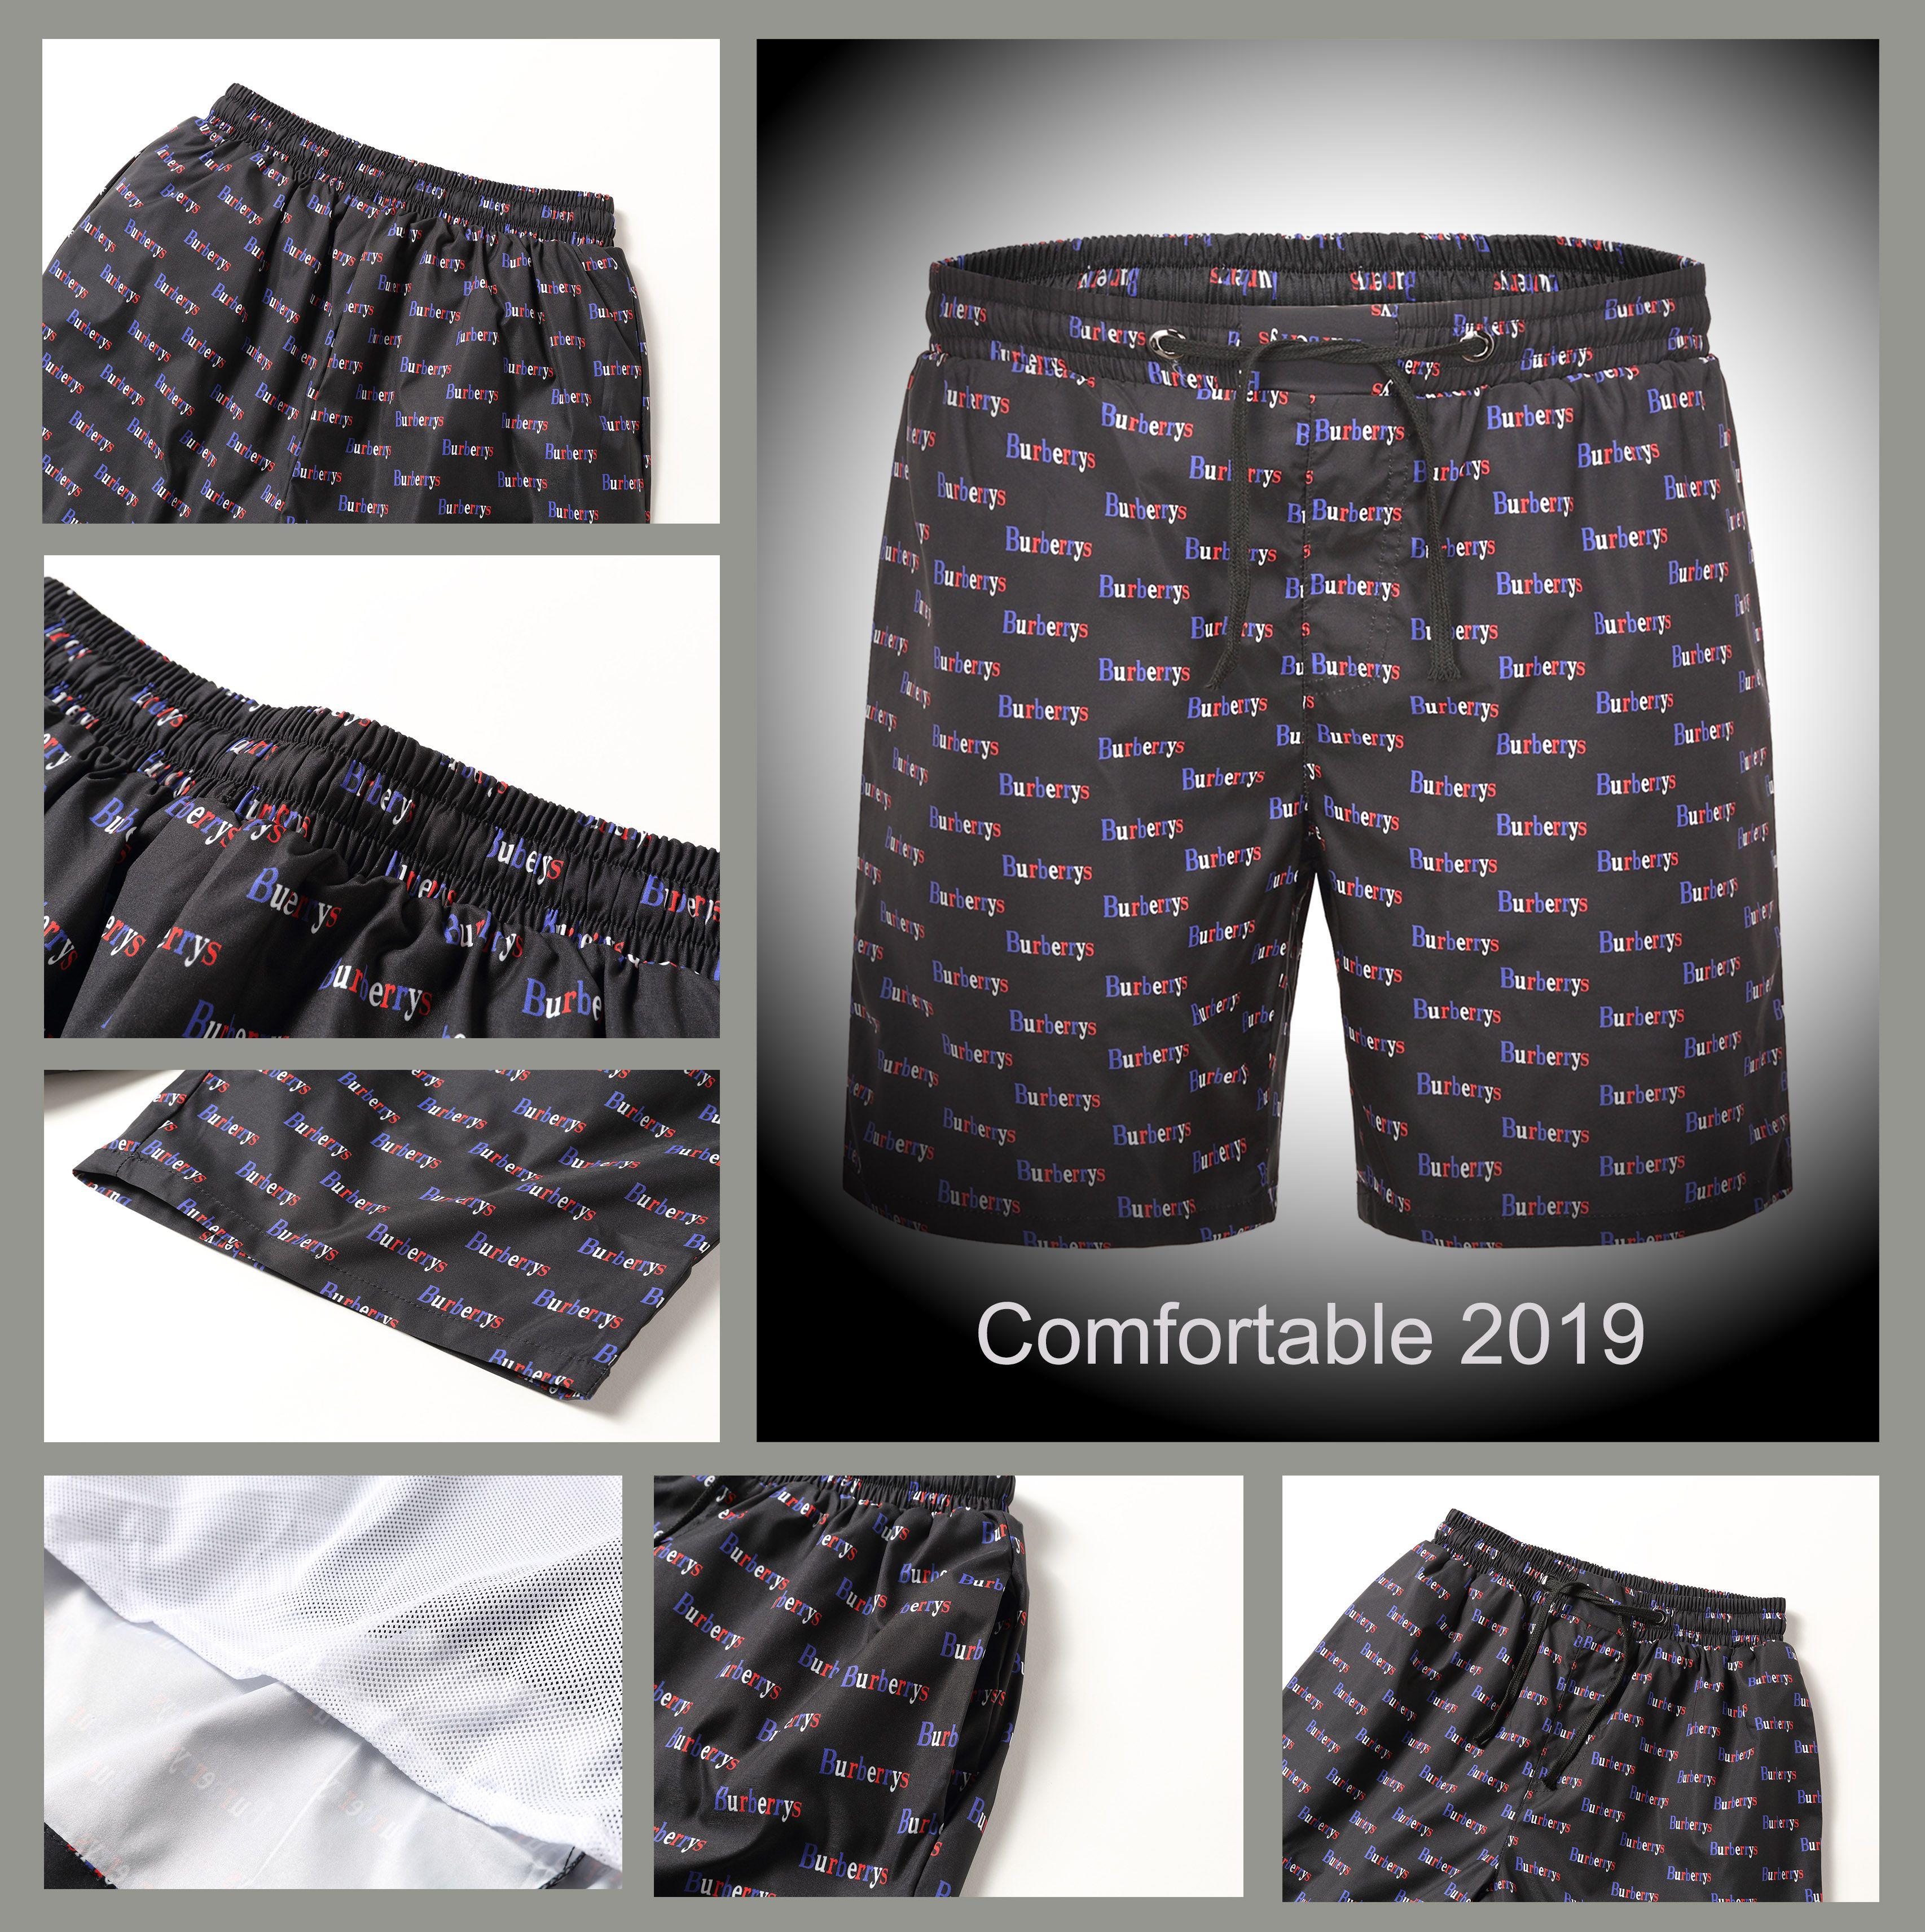 d7a77270c2 2019 summer shorts men's fashion brand monogrammed brand designer original  beach pants men's shorts elastic band fitness men's board shorts